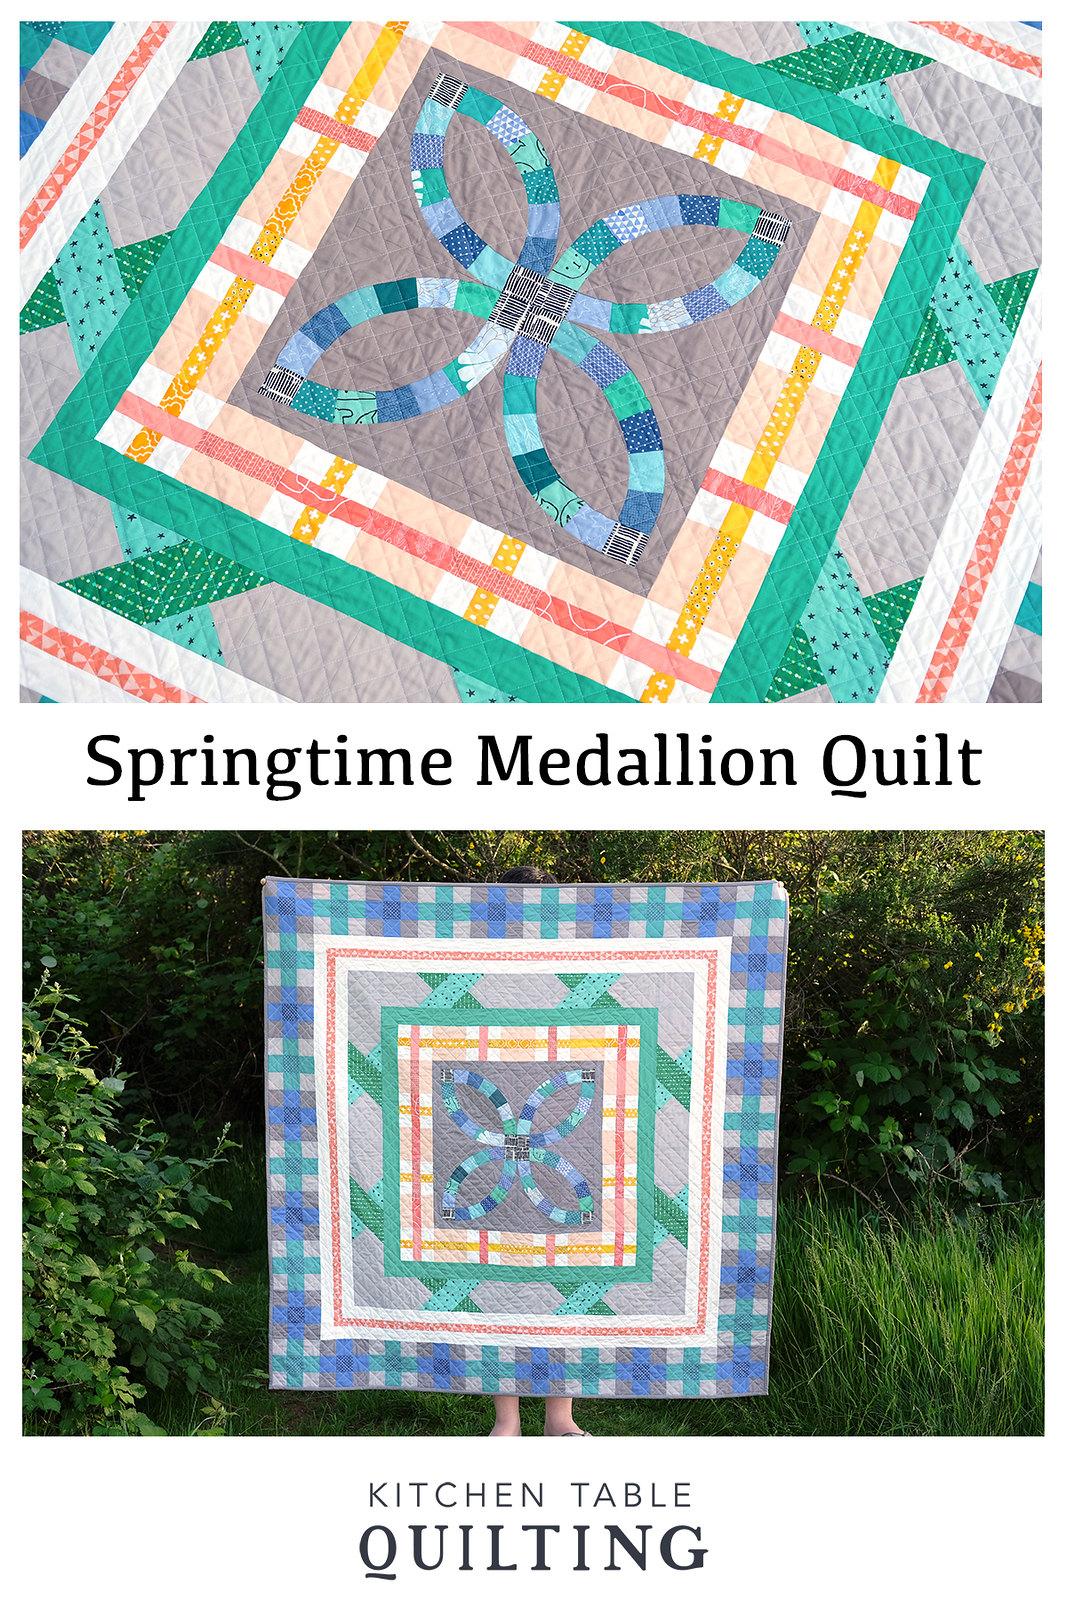 Springtime Medallion Quilt - Kitchen Table Quilting